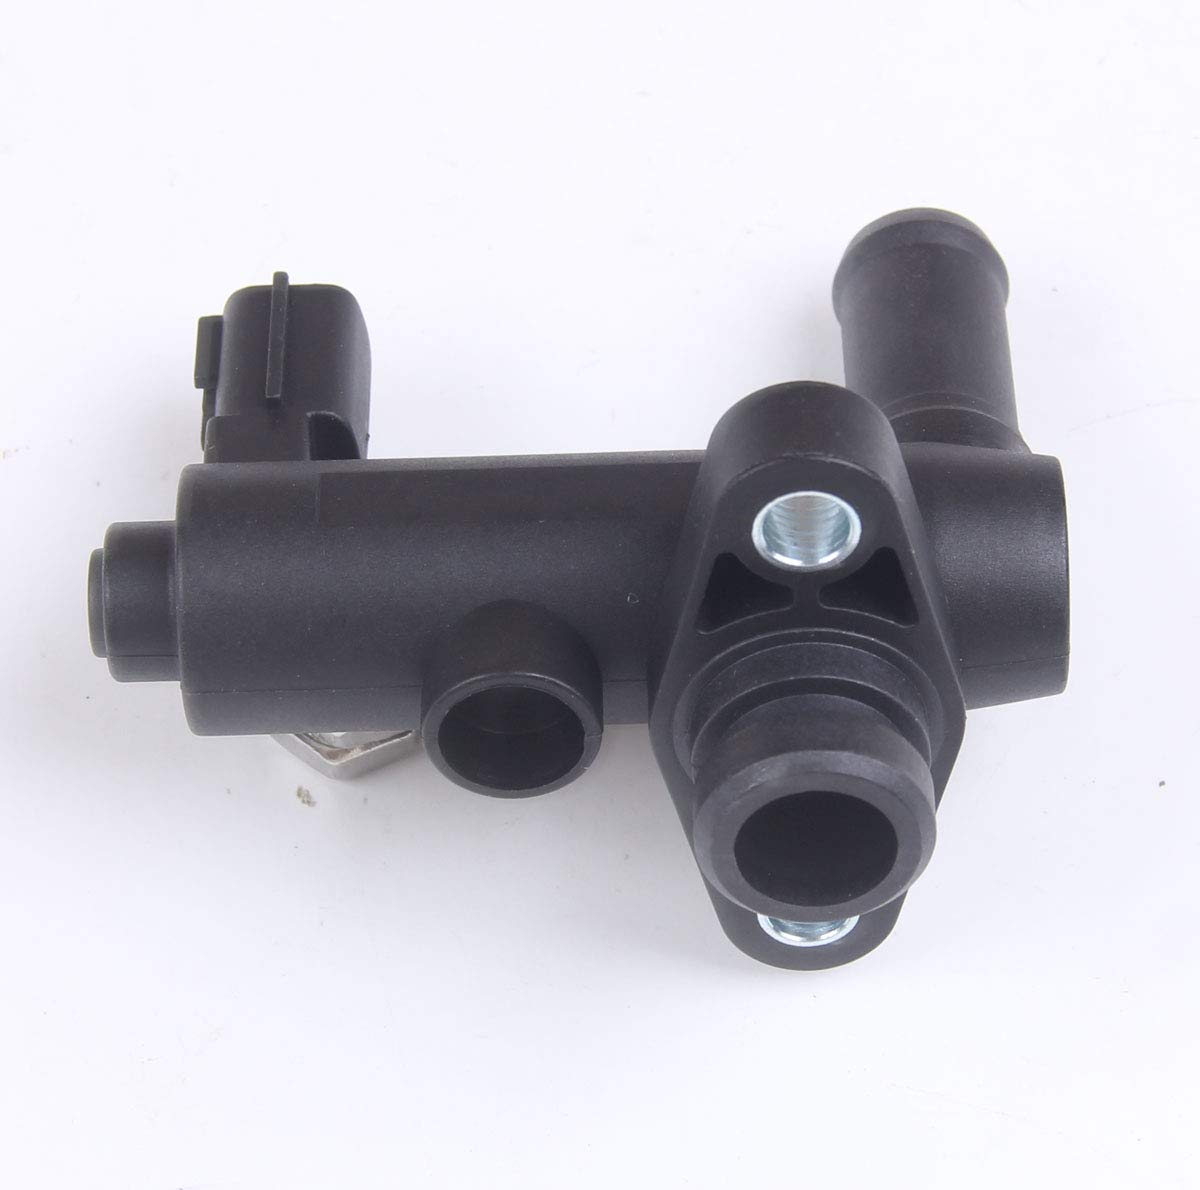 New Evaporative Emissions Canister Vent Valve Solenoid For Nissan 2000-2003 Sentra 2002-2004 Xterra Infiniti I35 QX4R Replace Dorman 911-502